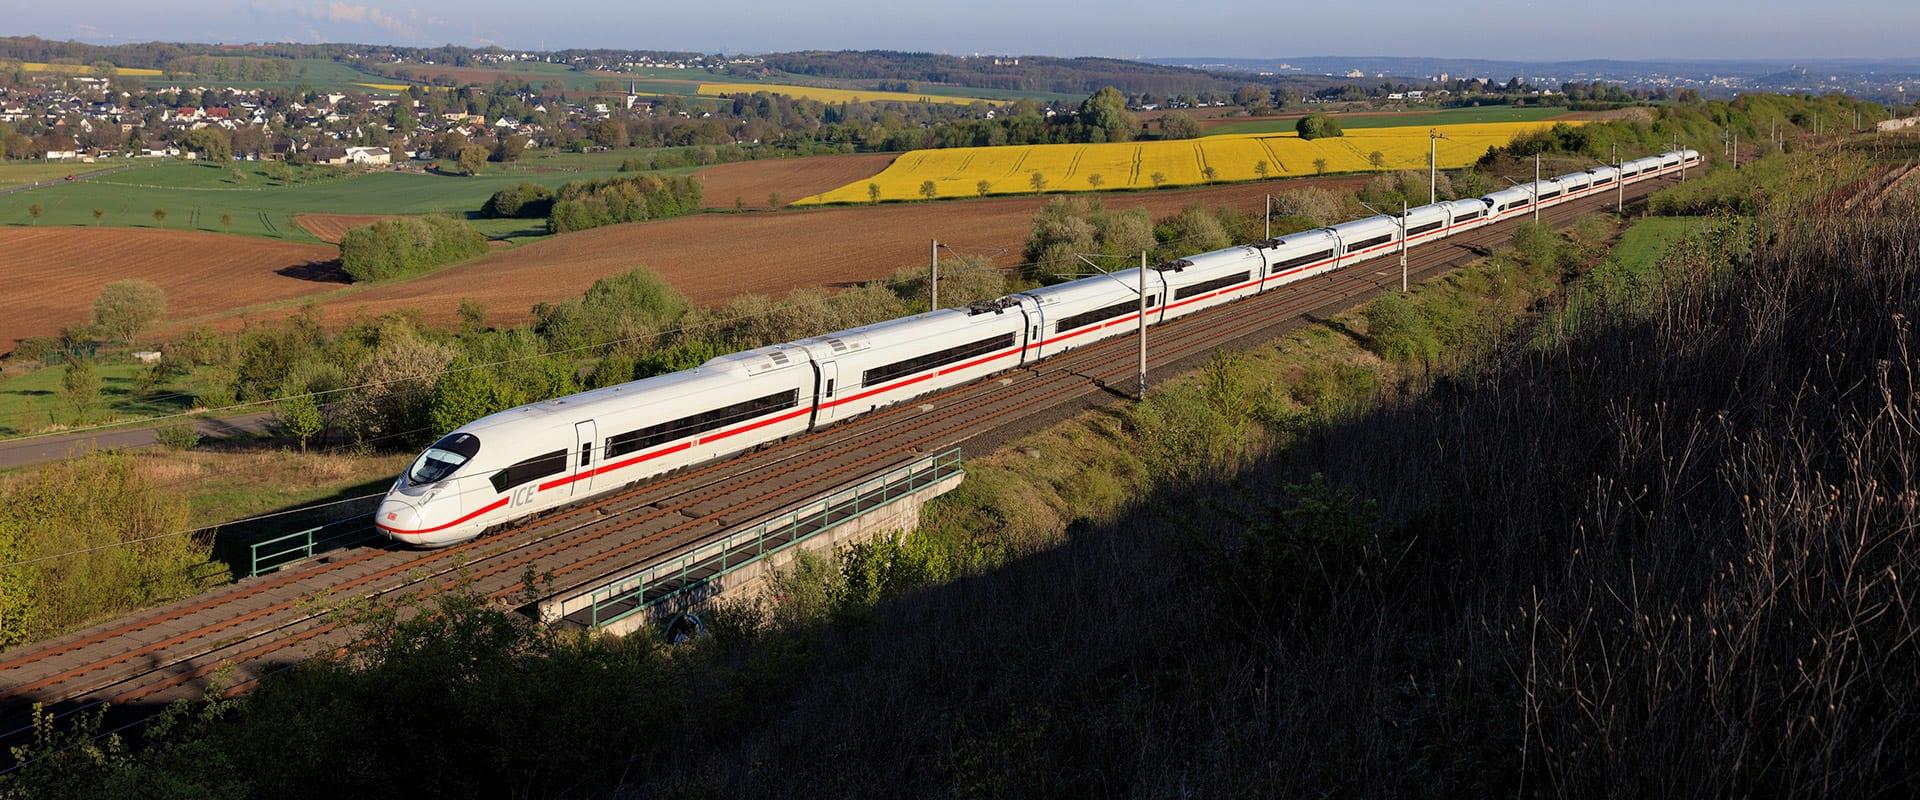 Alemanha em trem – de Frankfurt a Munique